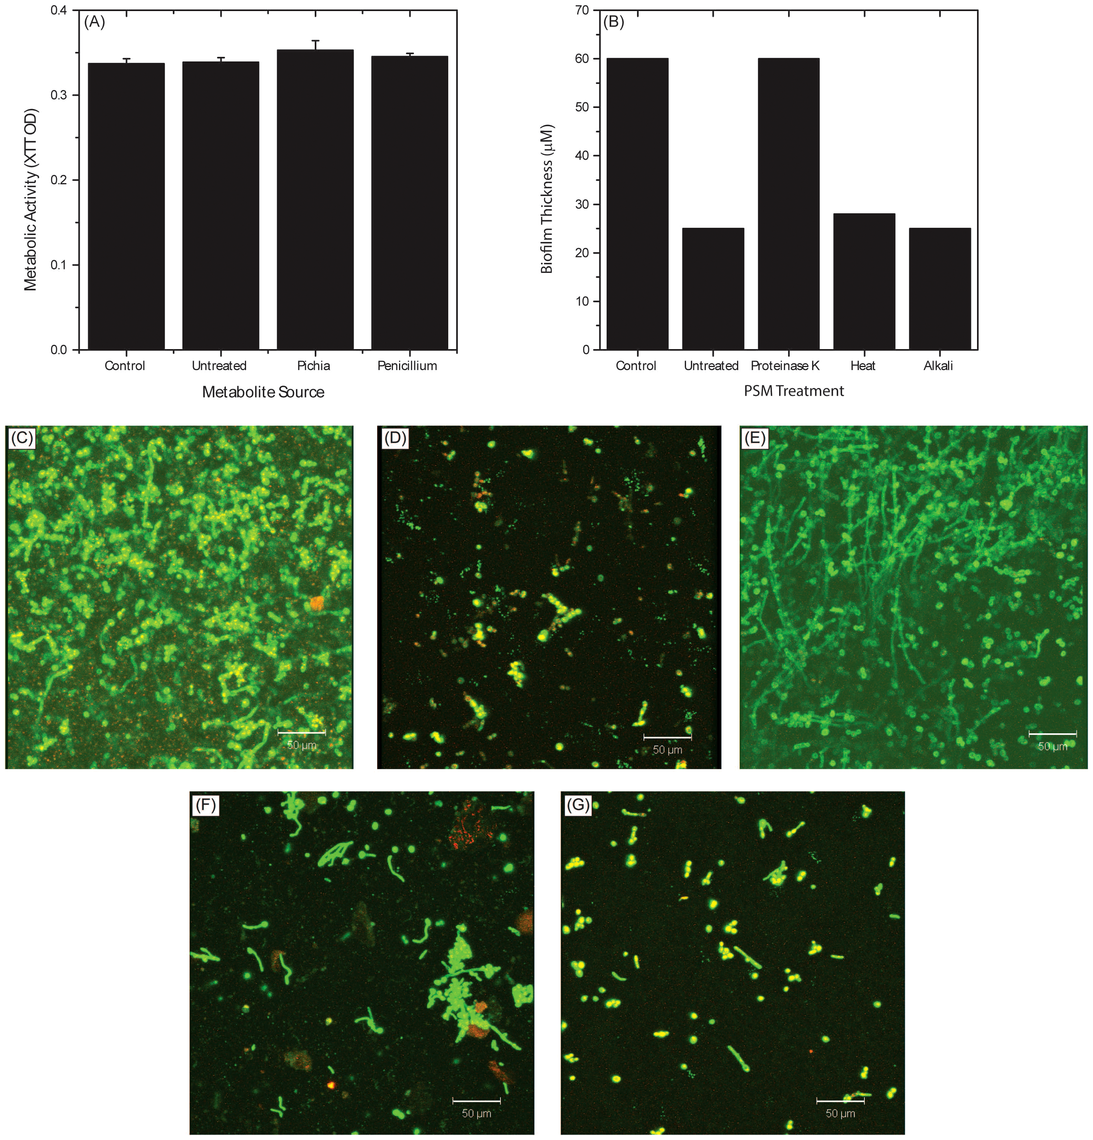 Biochemical characterization of Pichia spent medium.